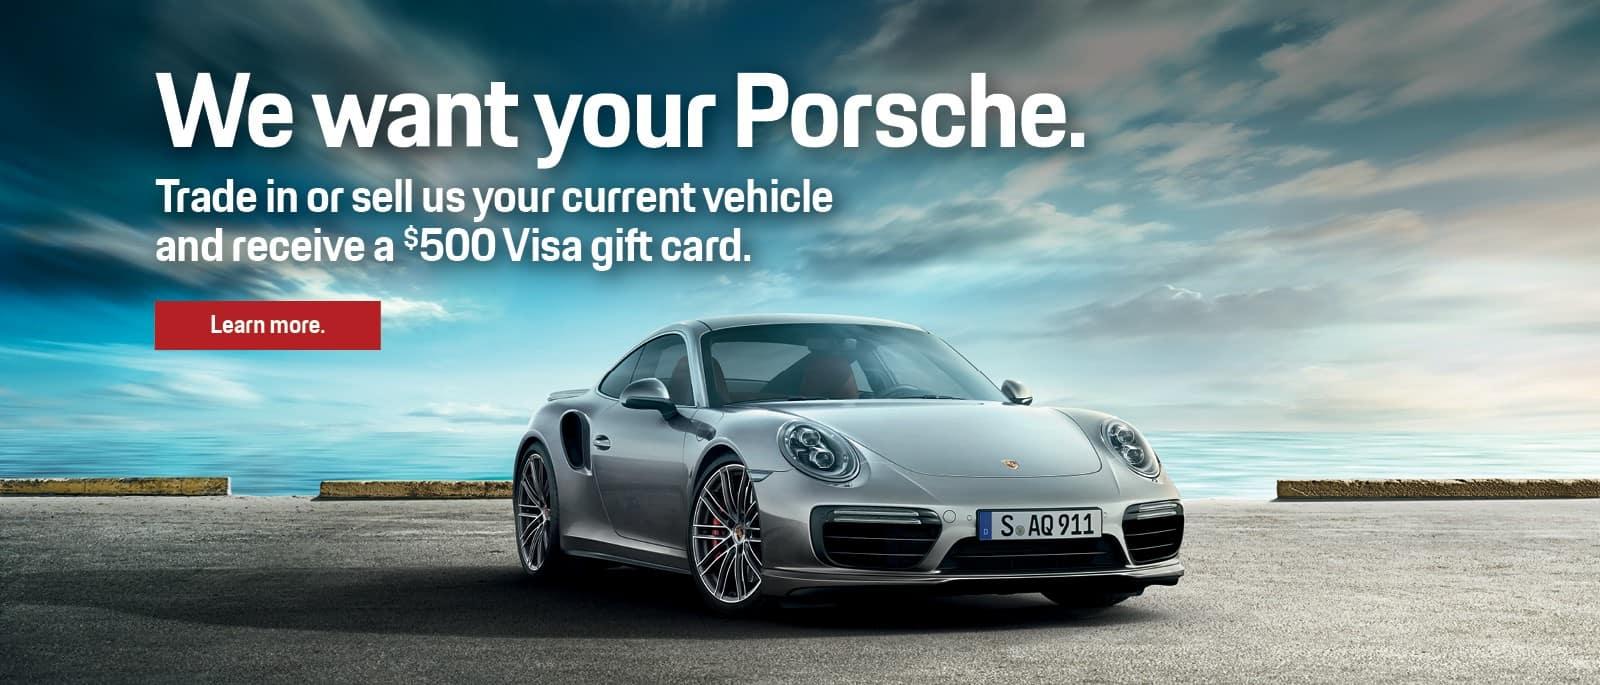 Porsche Trade In Event